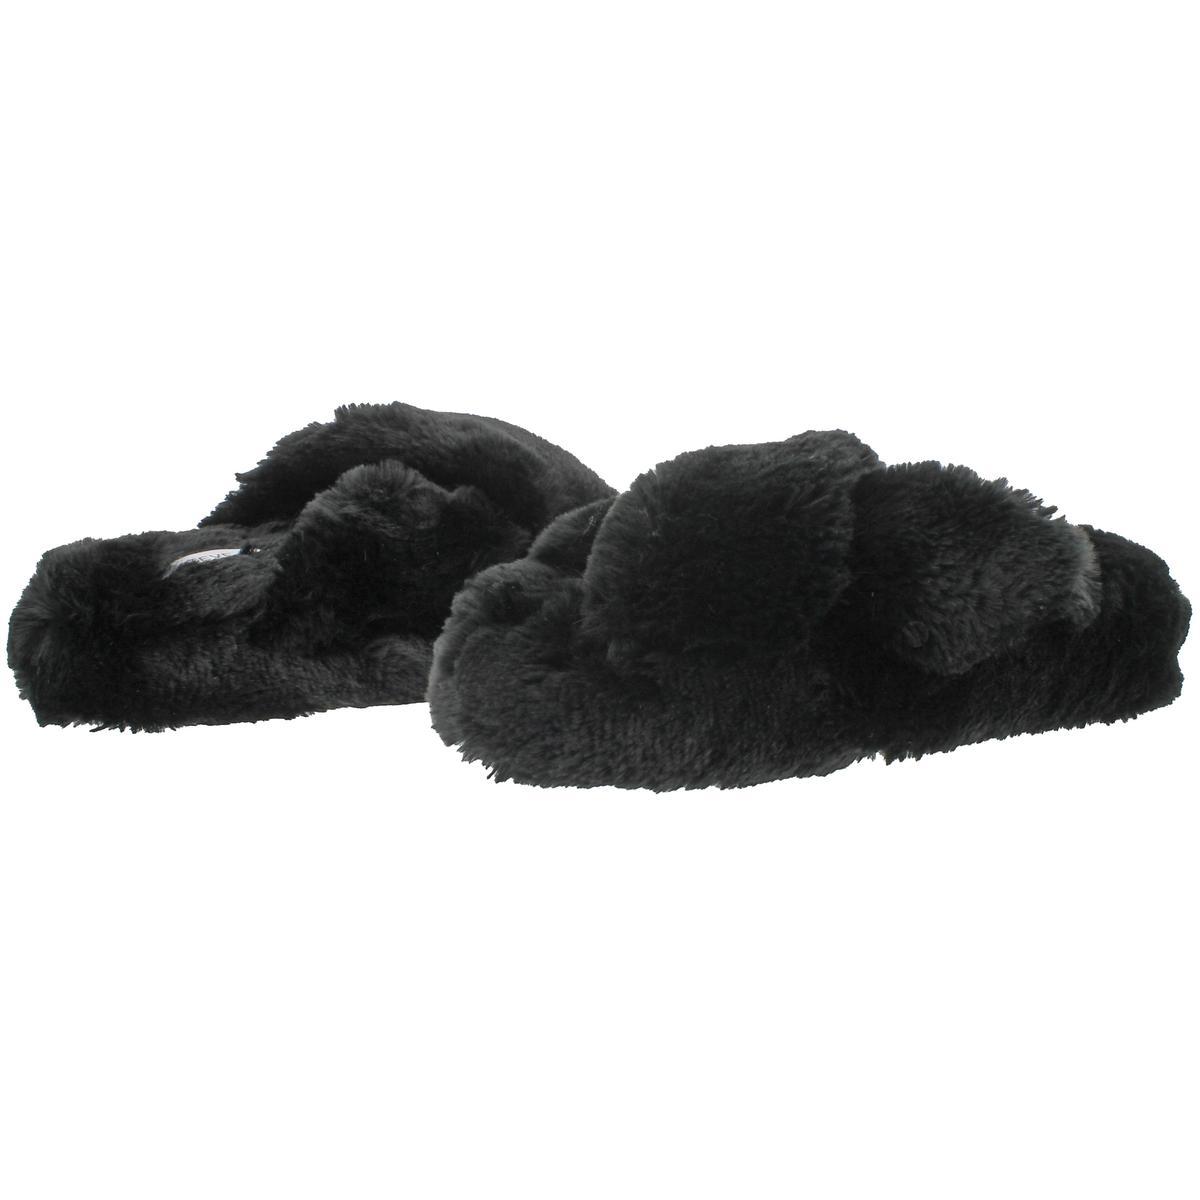 6f402a01dfc Steve Madden Comfy Women s Faux Fur Crisscross Open Toe Slide ...